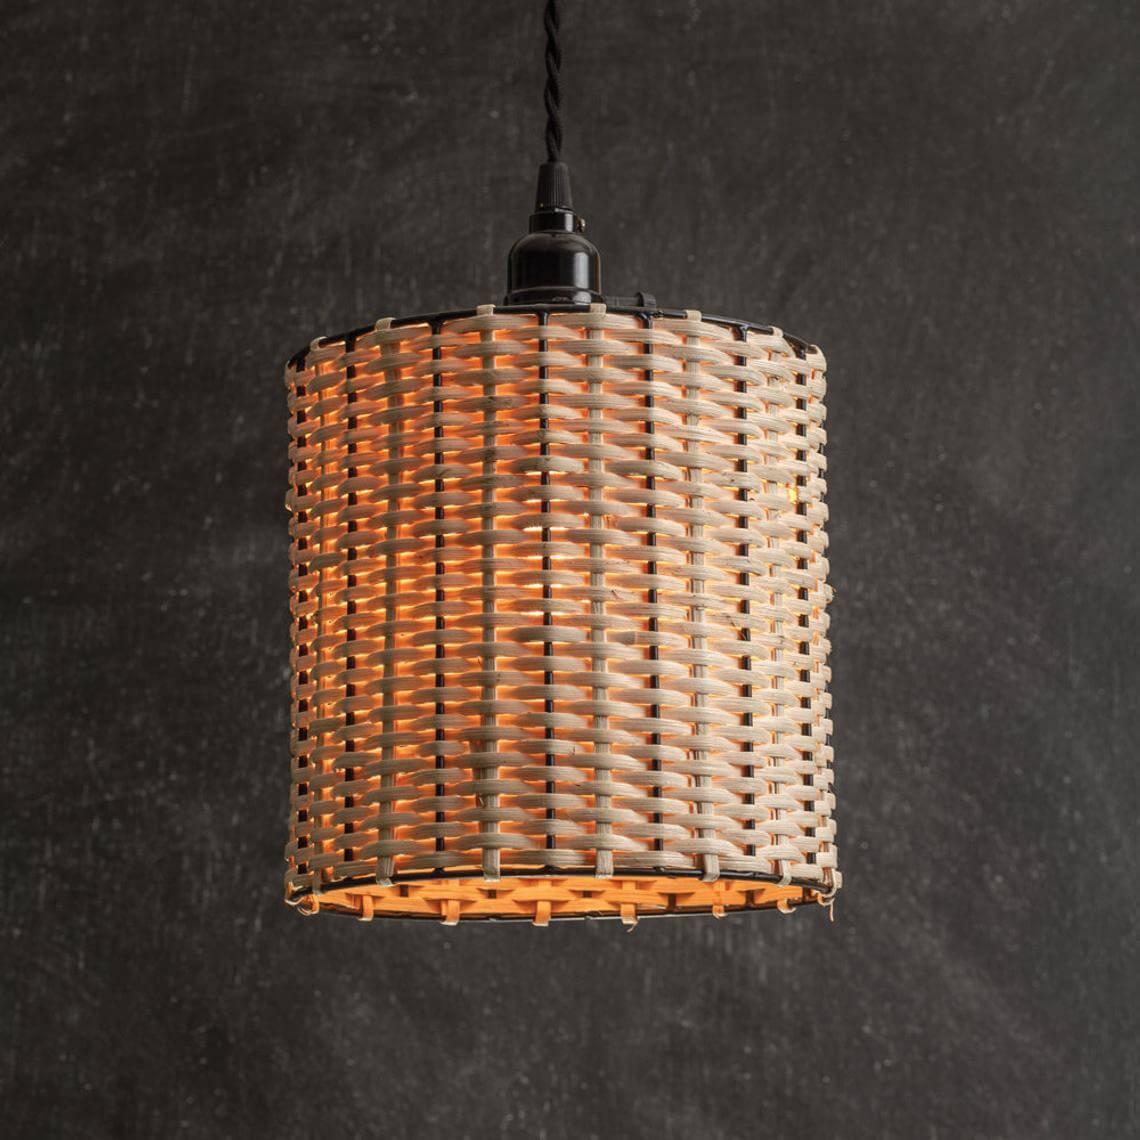 Weaved Decorative Drum Pendant Light